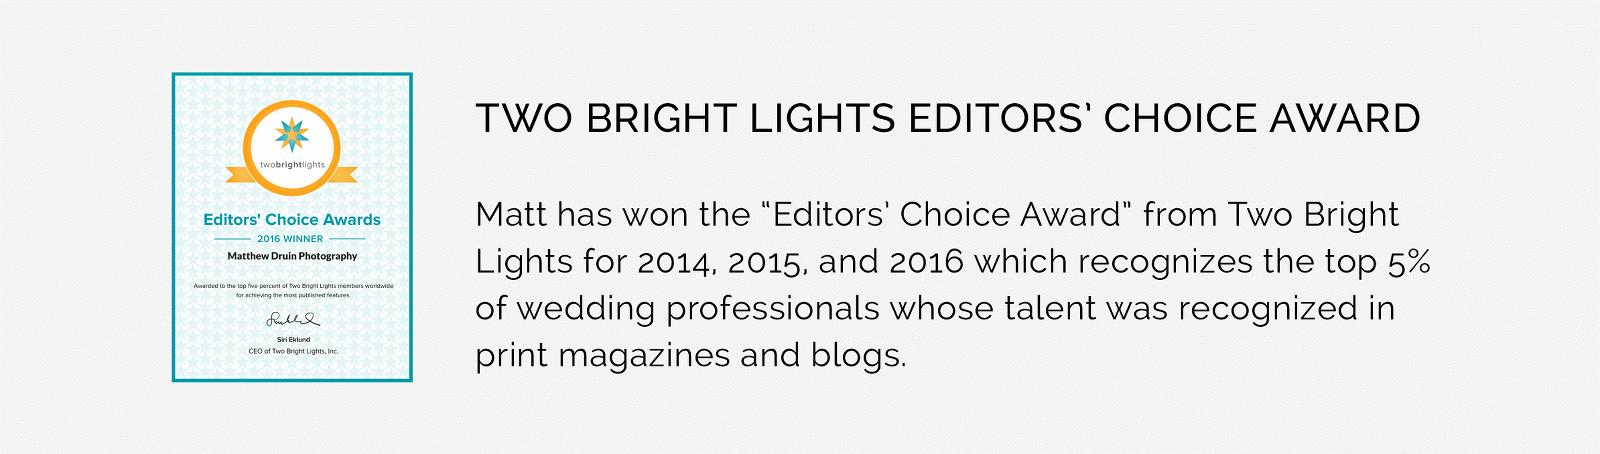 Award winning Wedding Photographers Matthew Druin + Co Two Bright Lights Award Winner